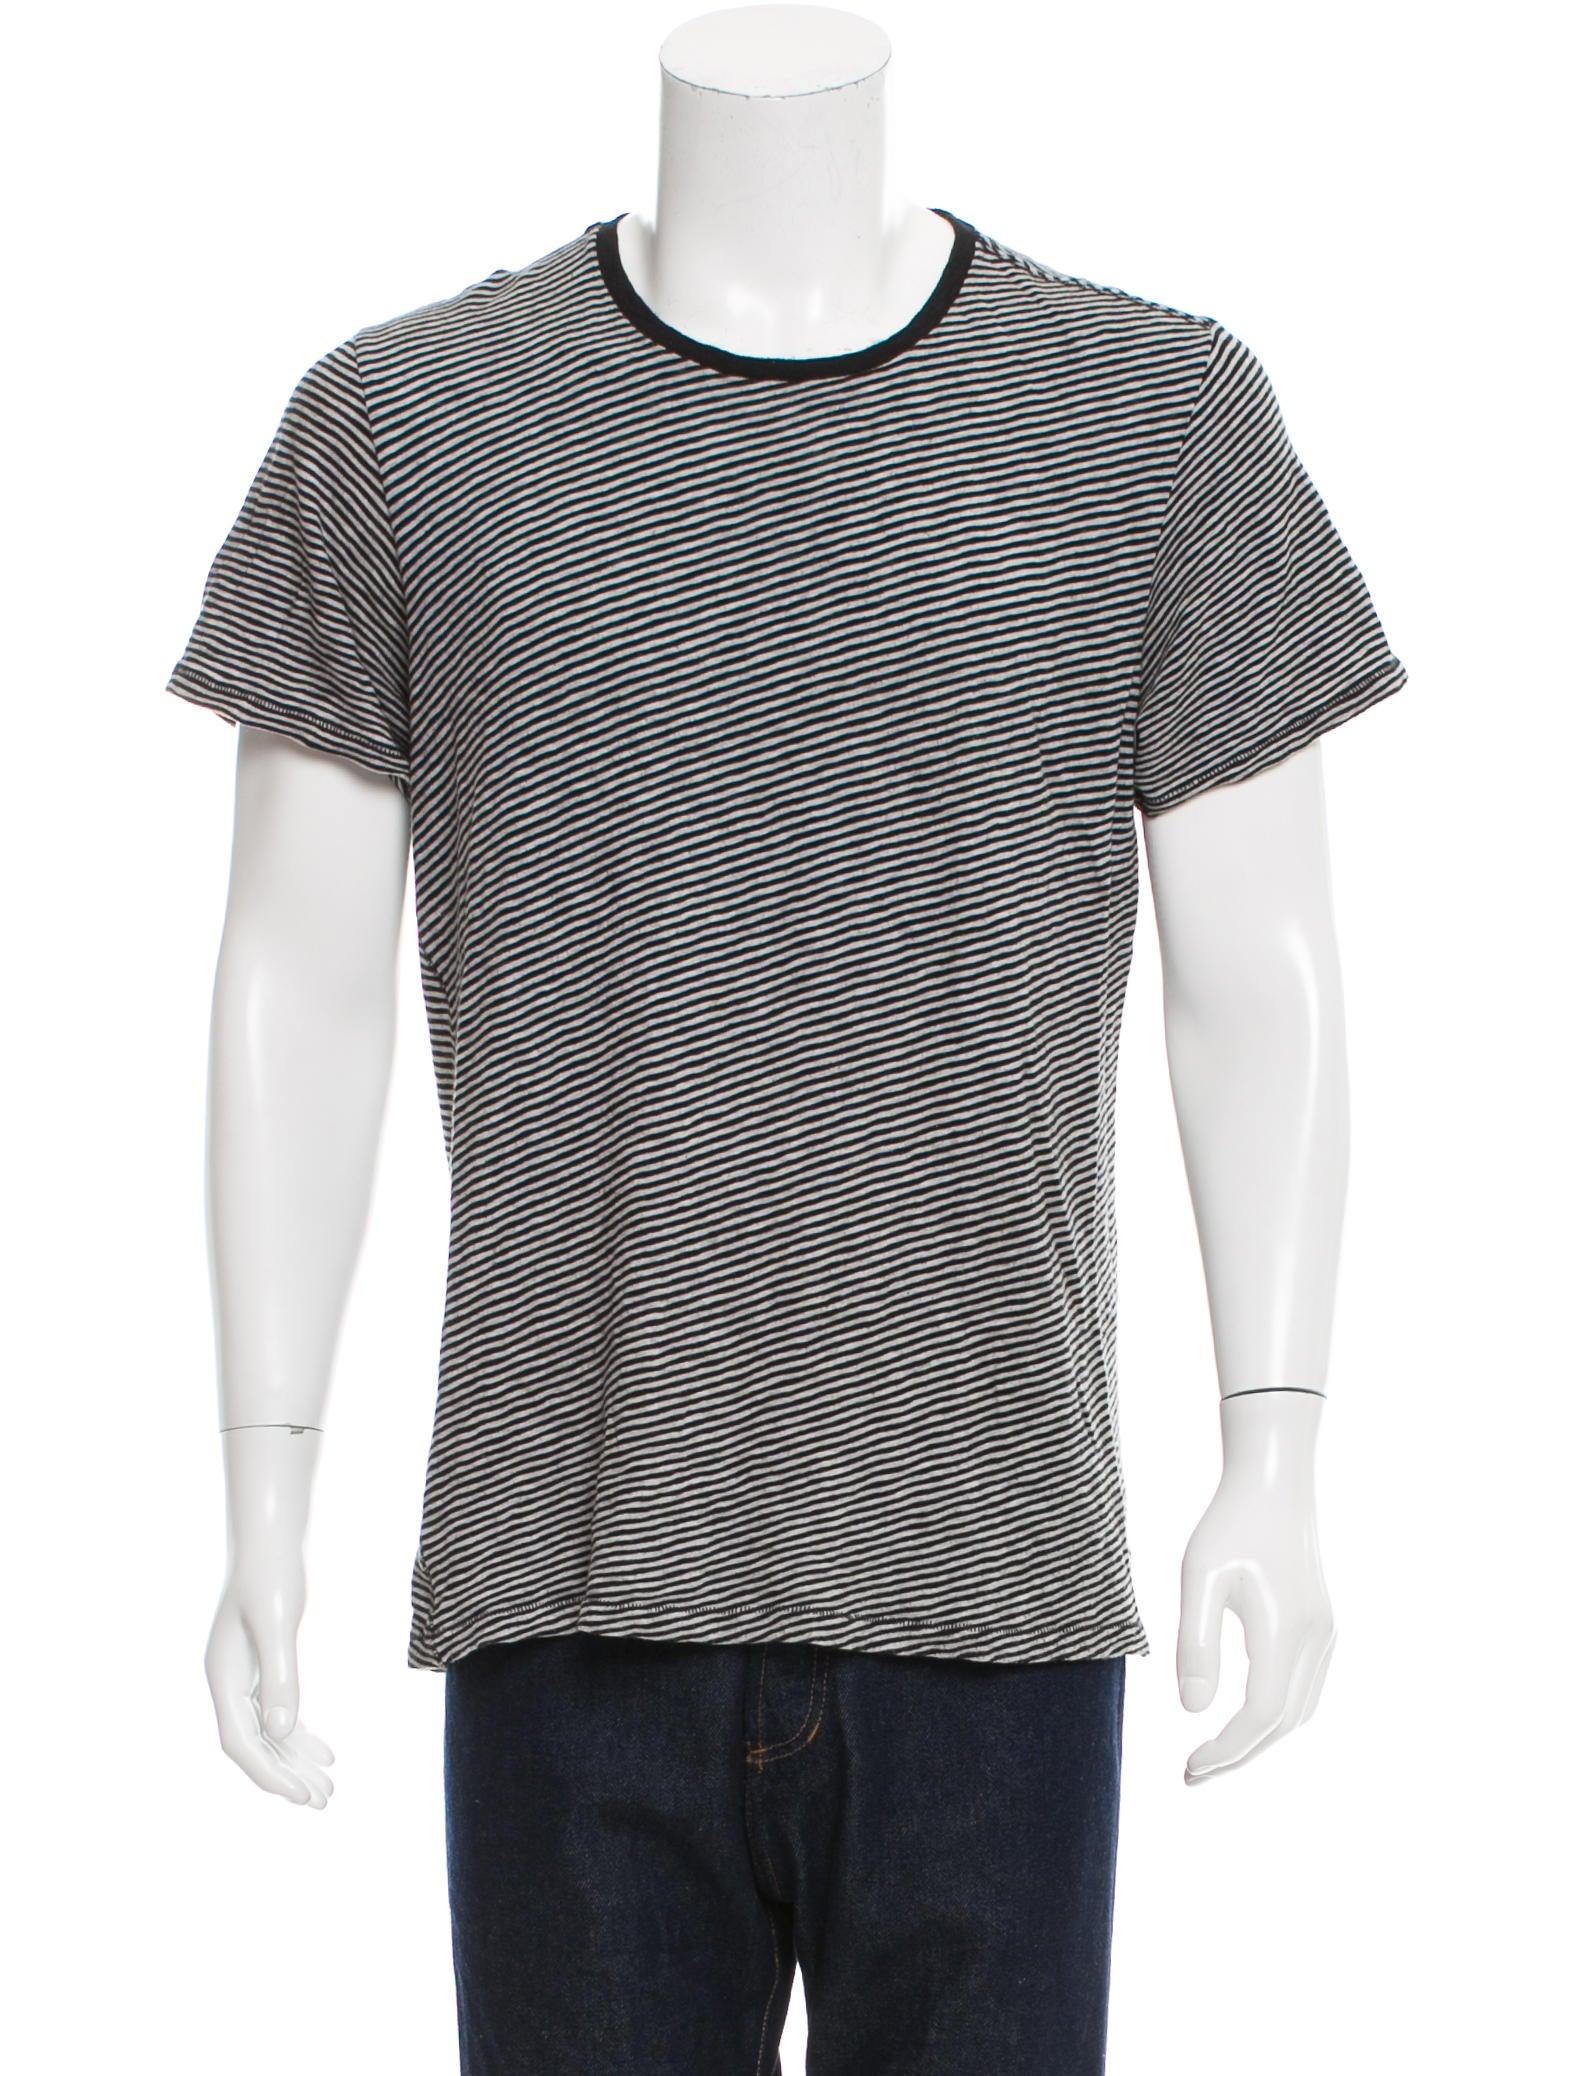 Rag Bone Striped Short Sleeve T Shirt Clothing